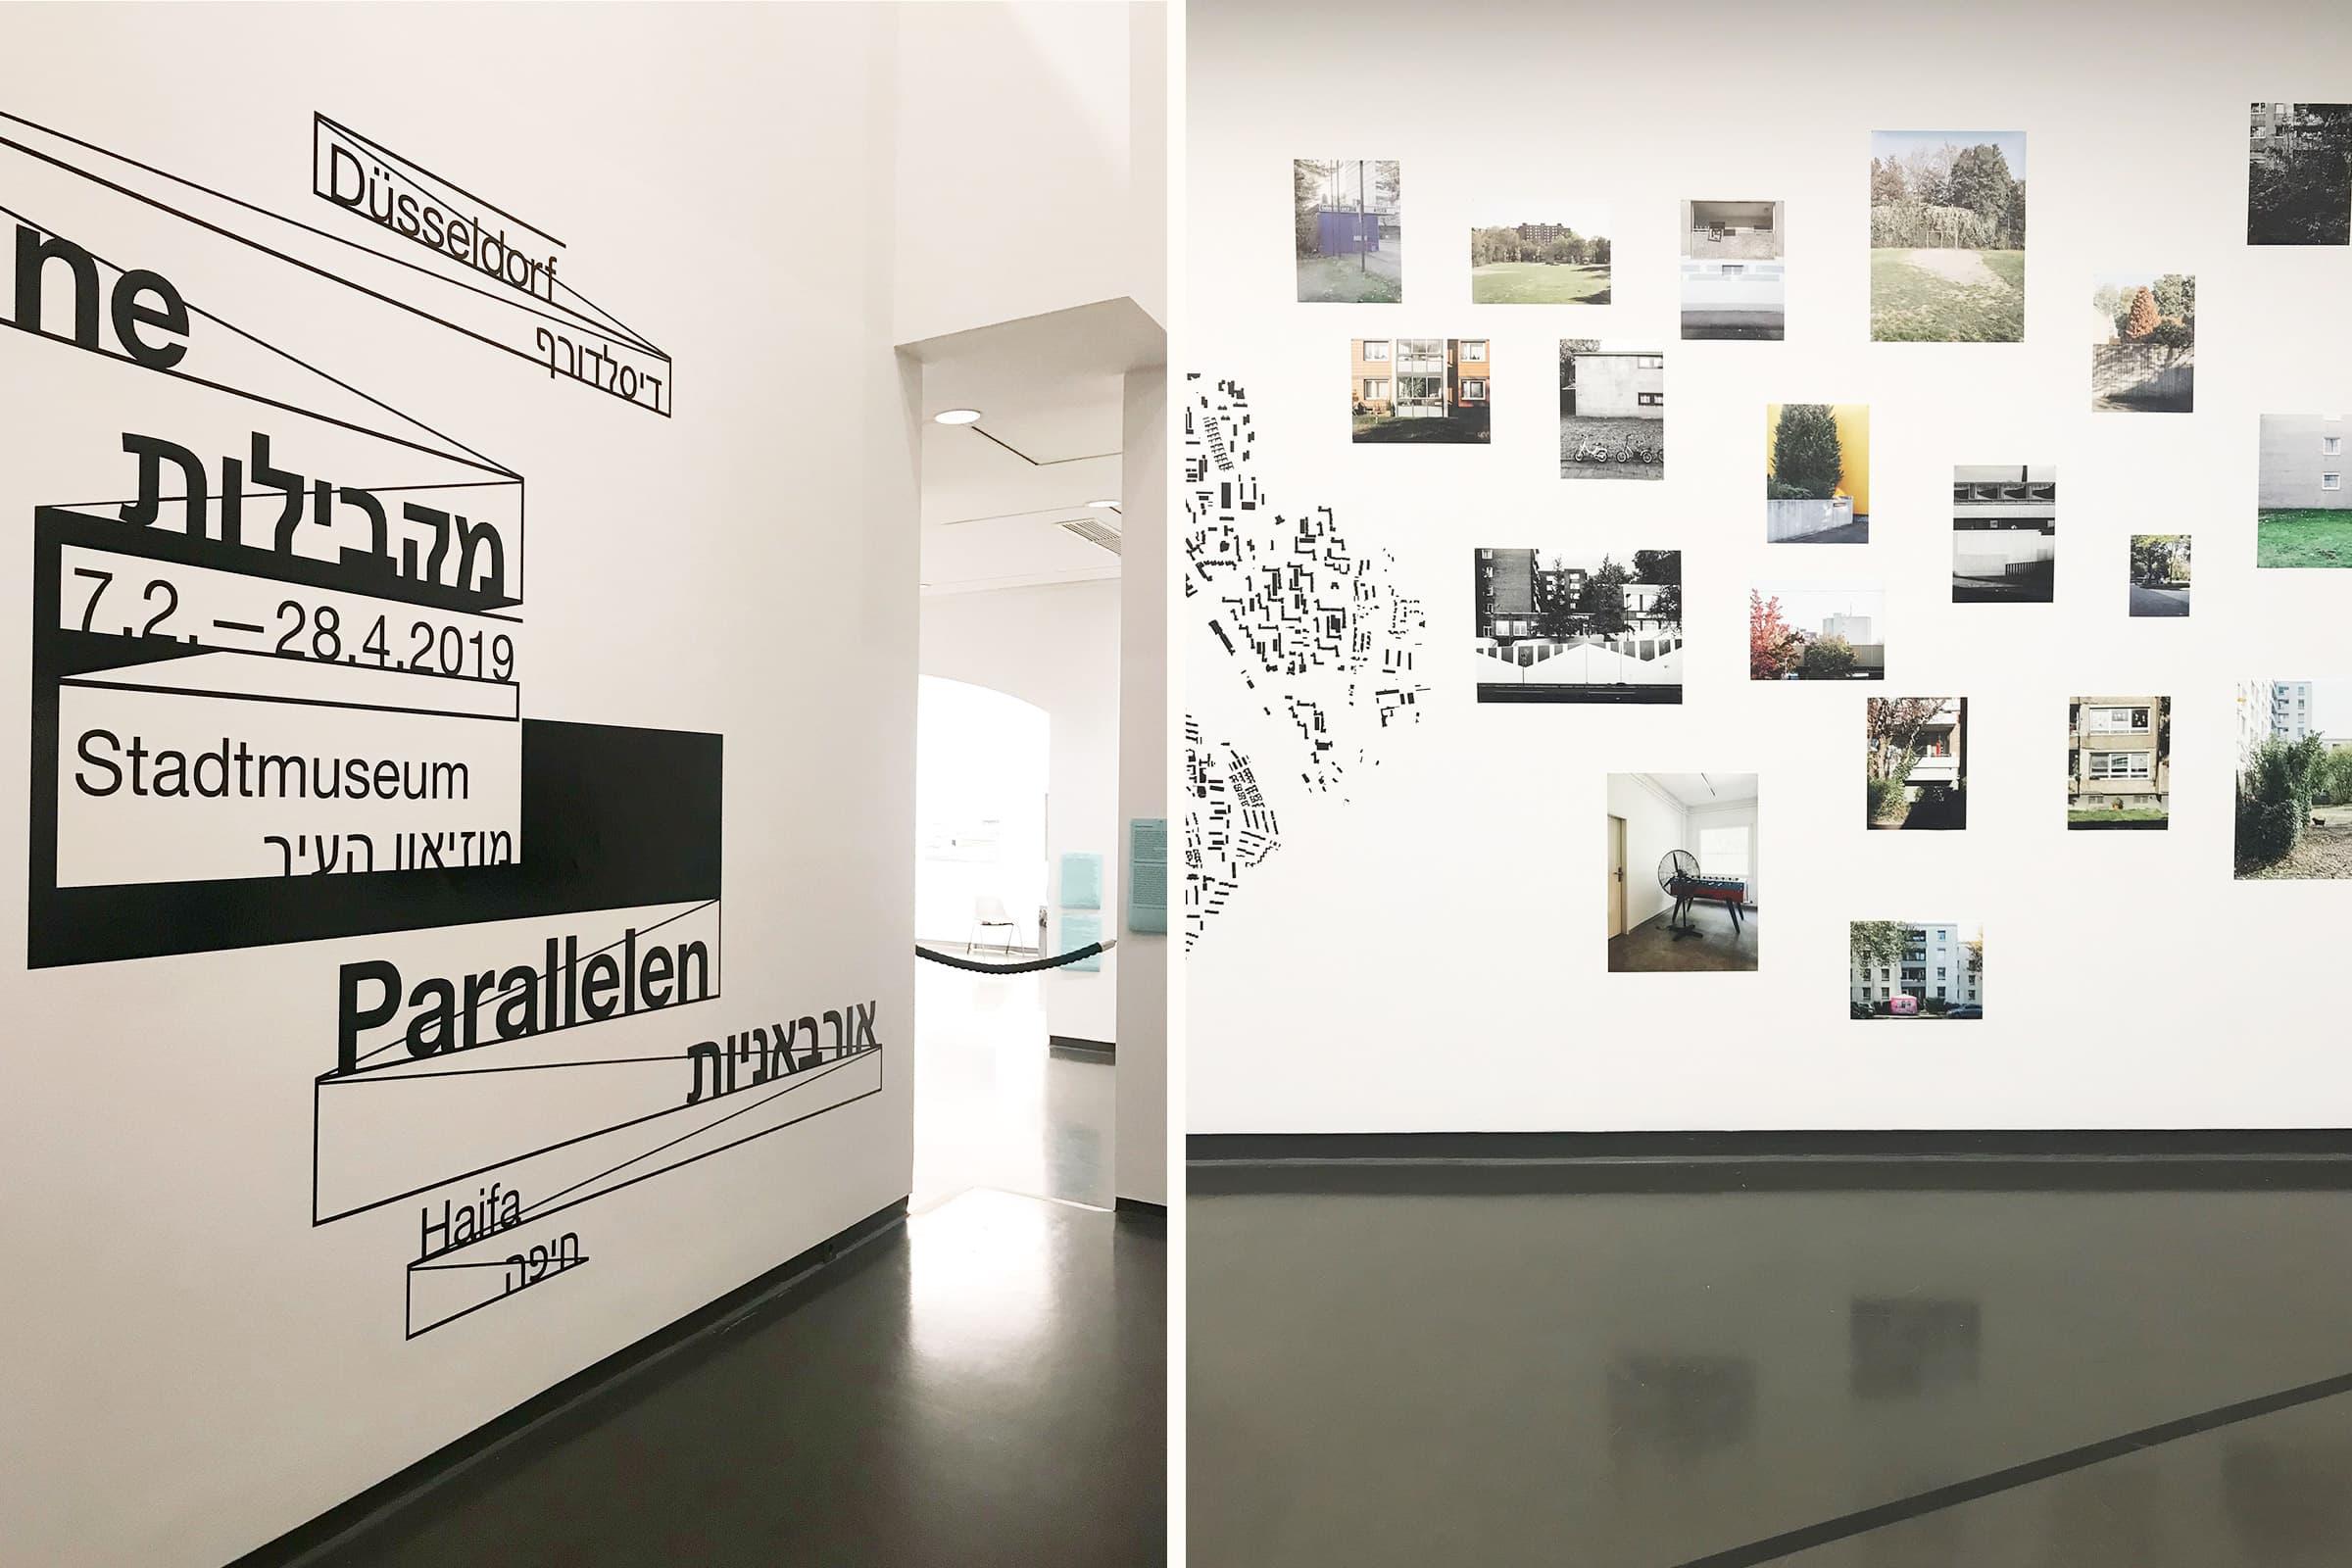 Düsseldorf, Stadtmuseum, Ausstellungsdesign, Grafik, Plottgrafik, Ausstellungsdisplay